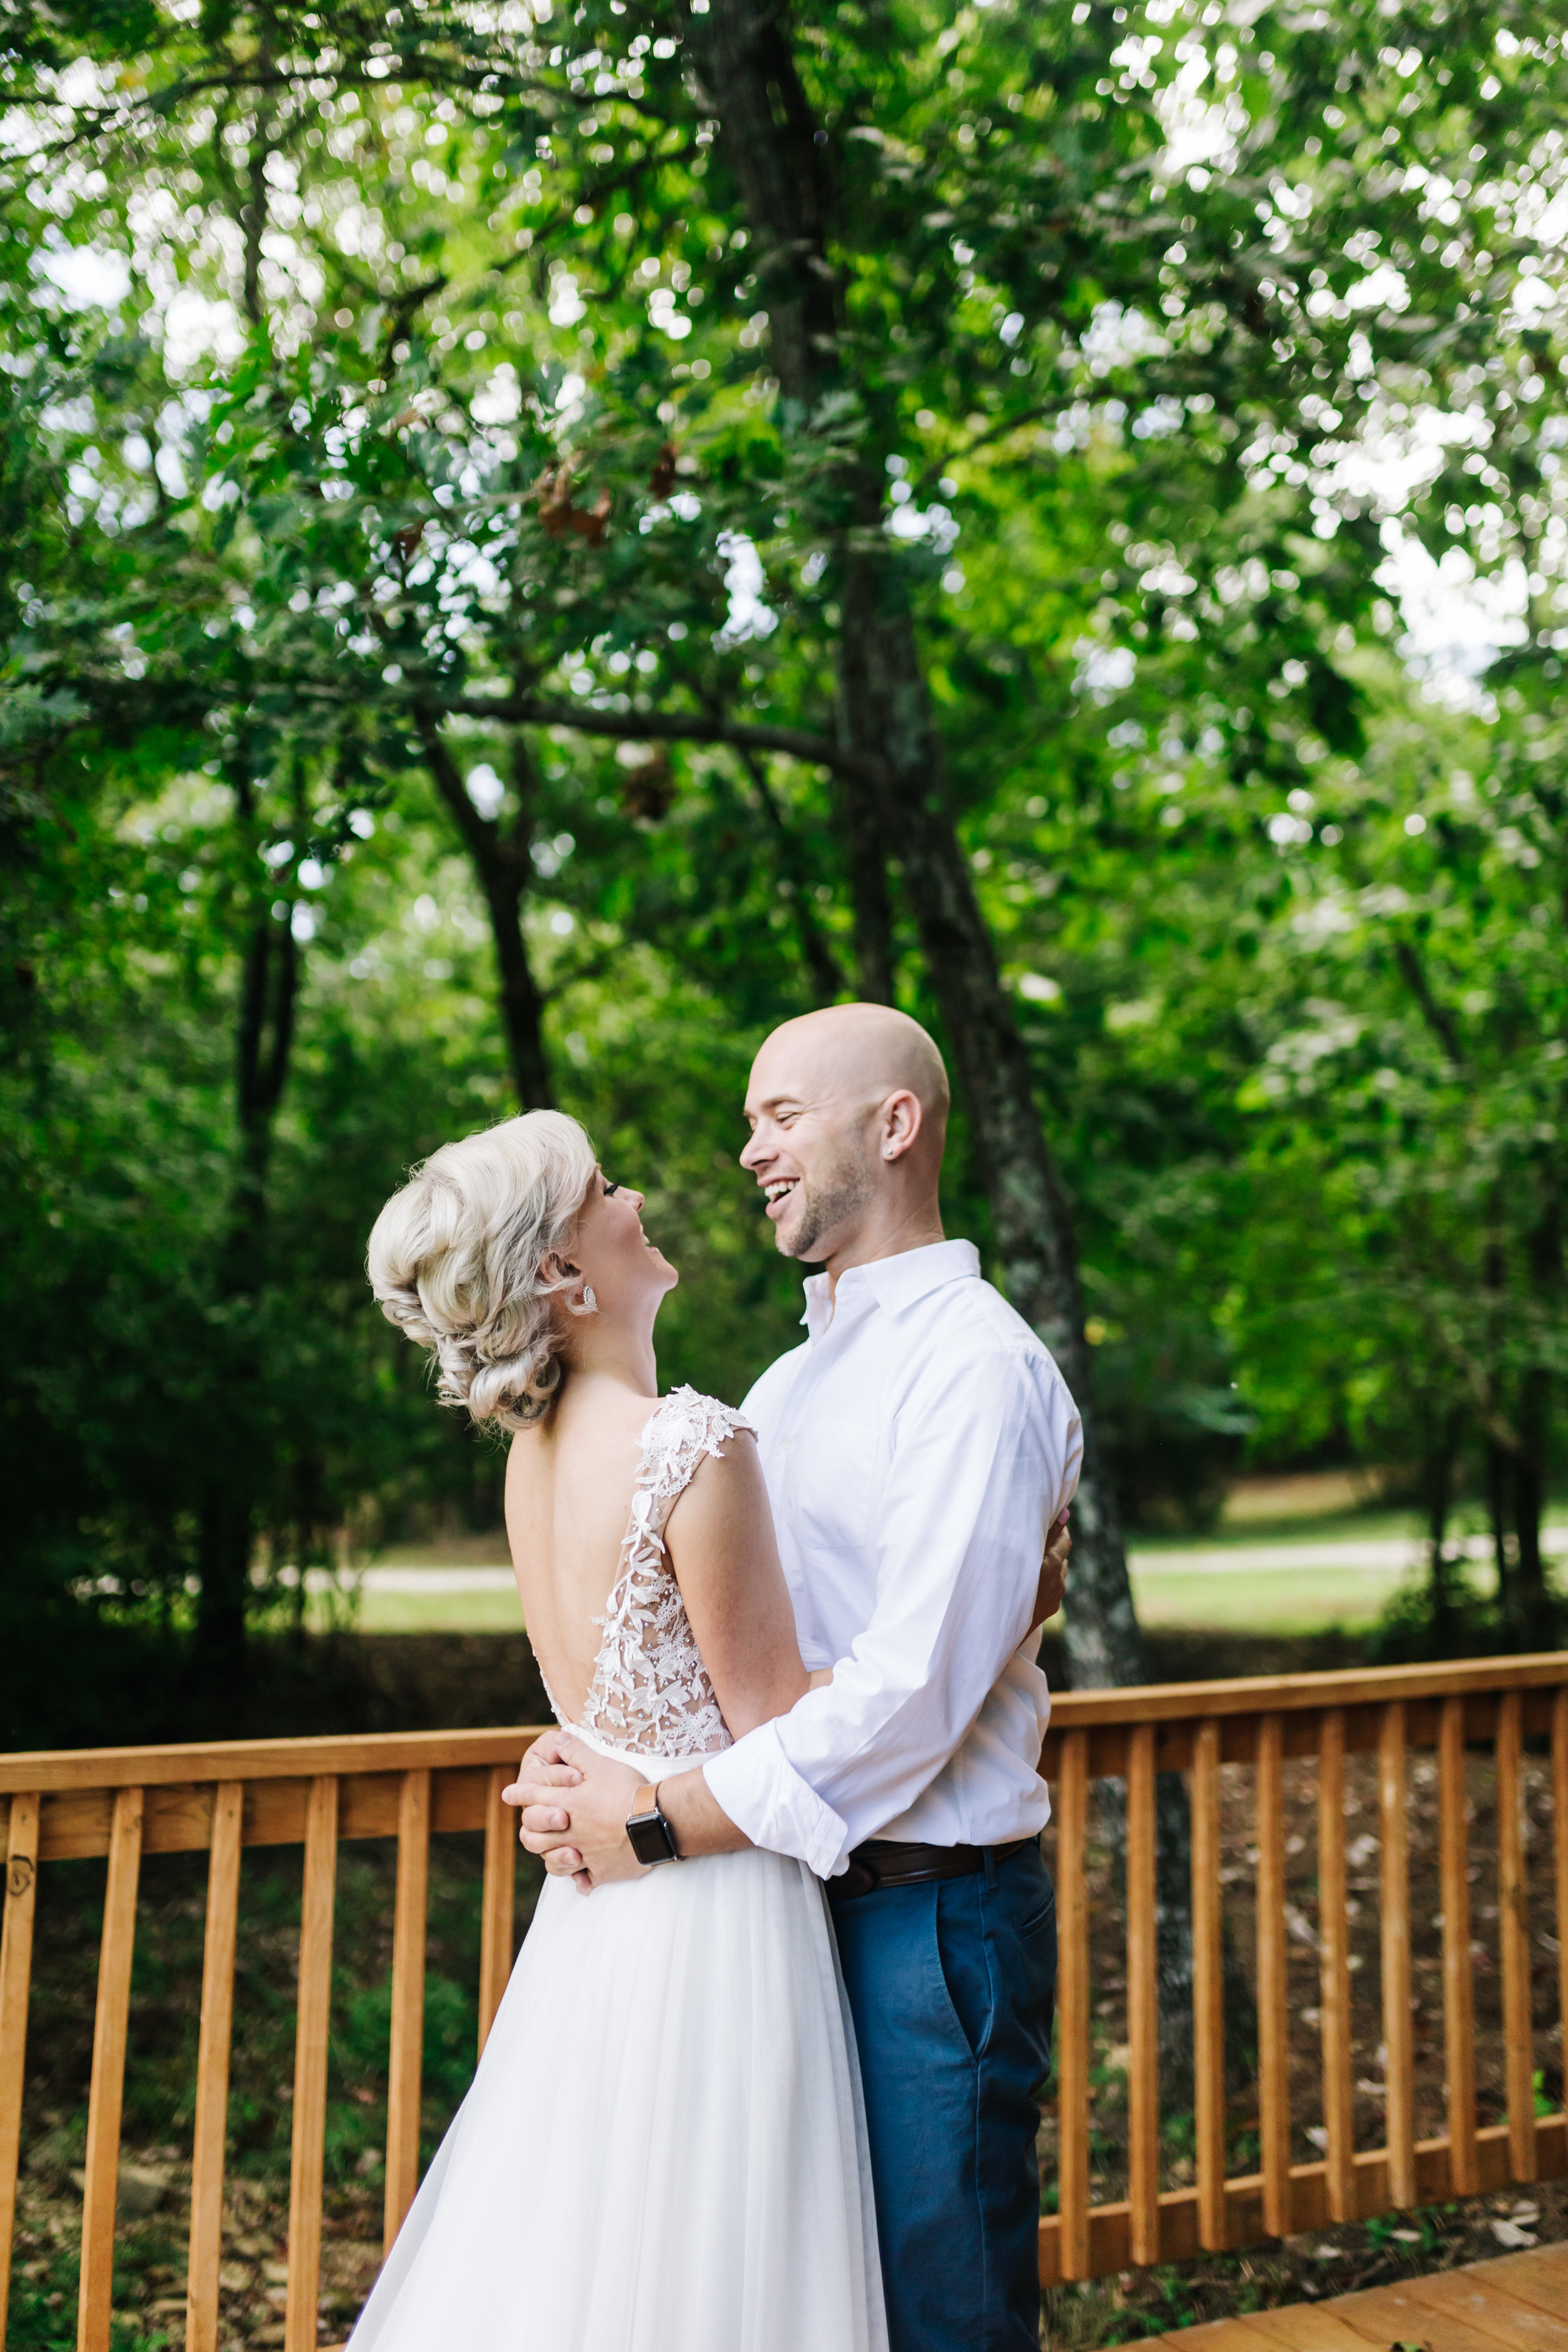 2018.09.02 Ray and Sarah Prizner Nashville TN Wedding FINALS-61.jpg